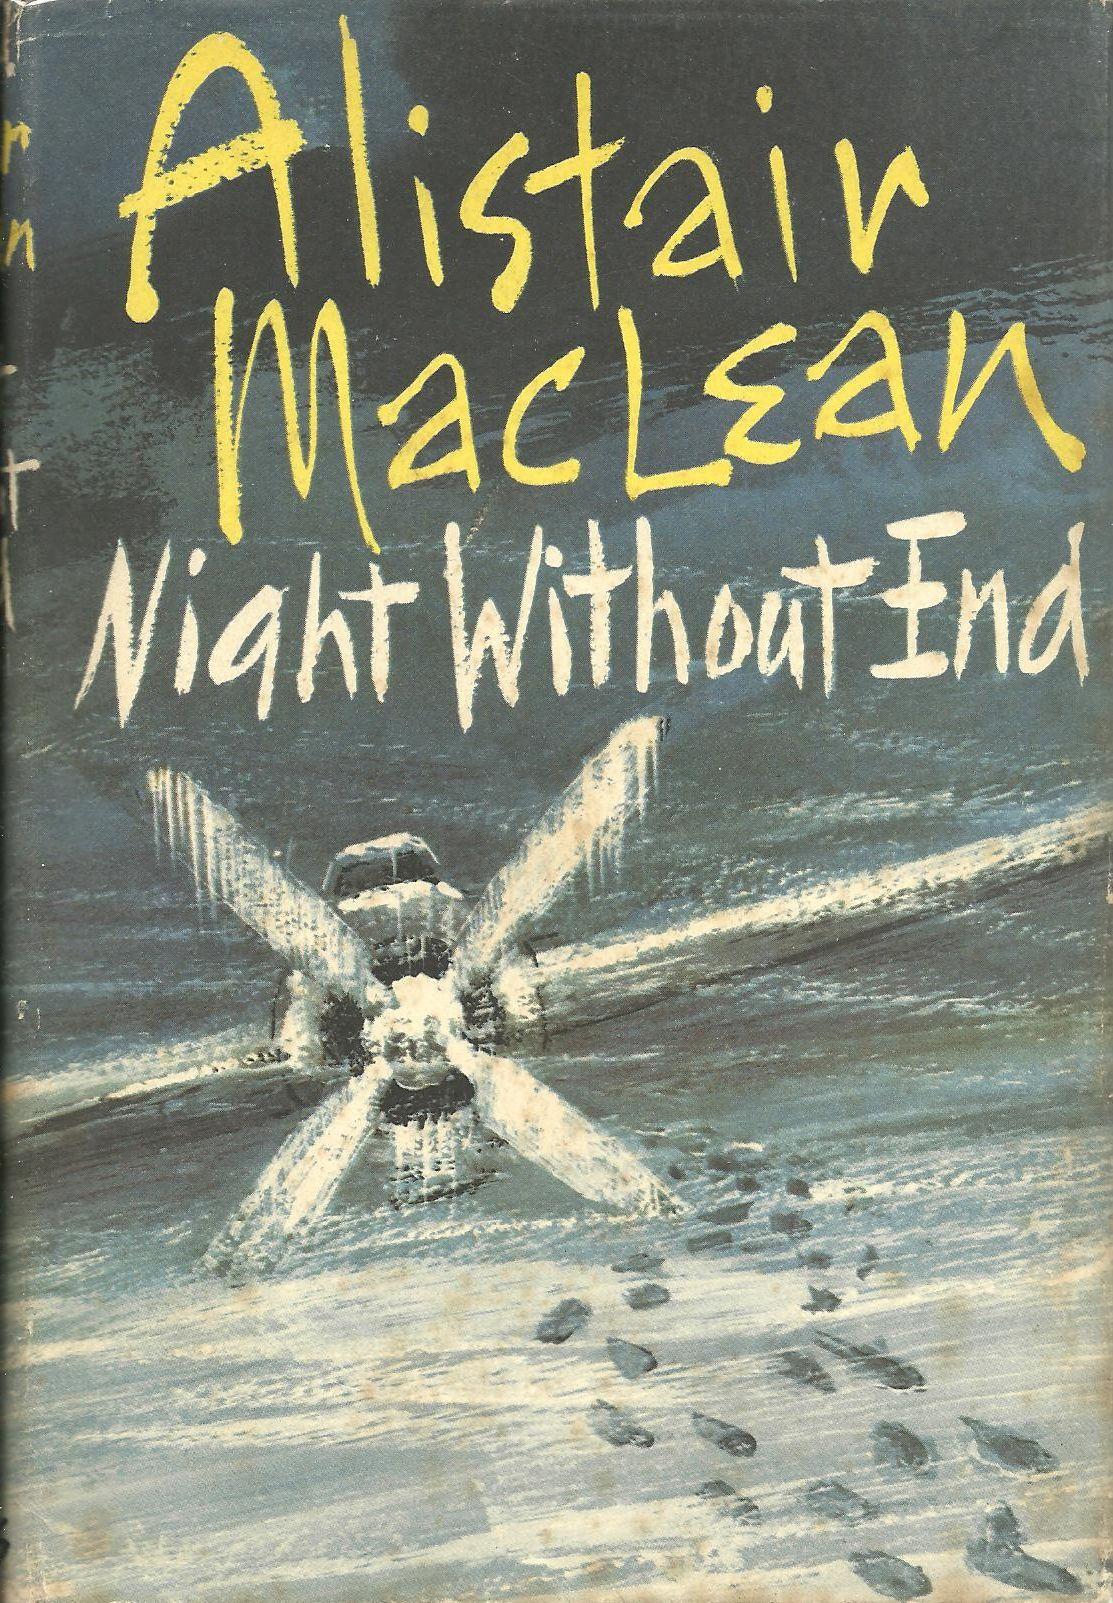 Алистер Маклин — Ночи нет конца (1959)